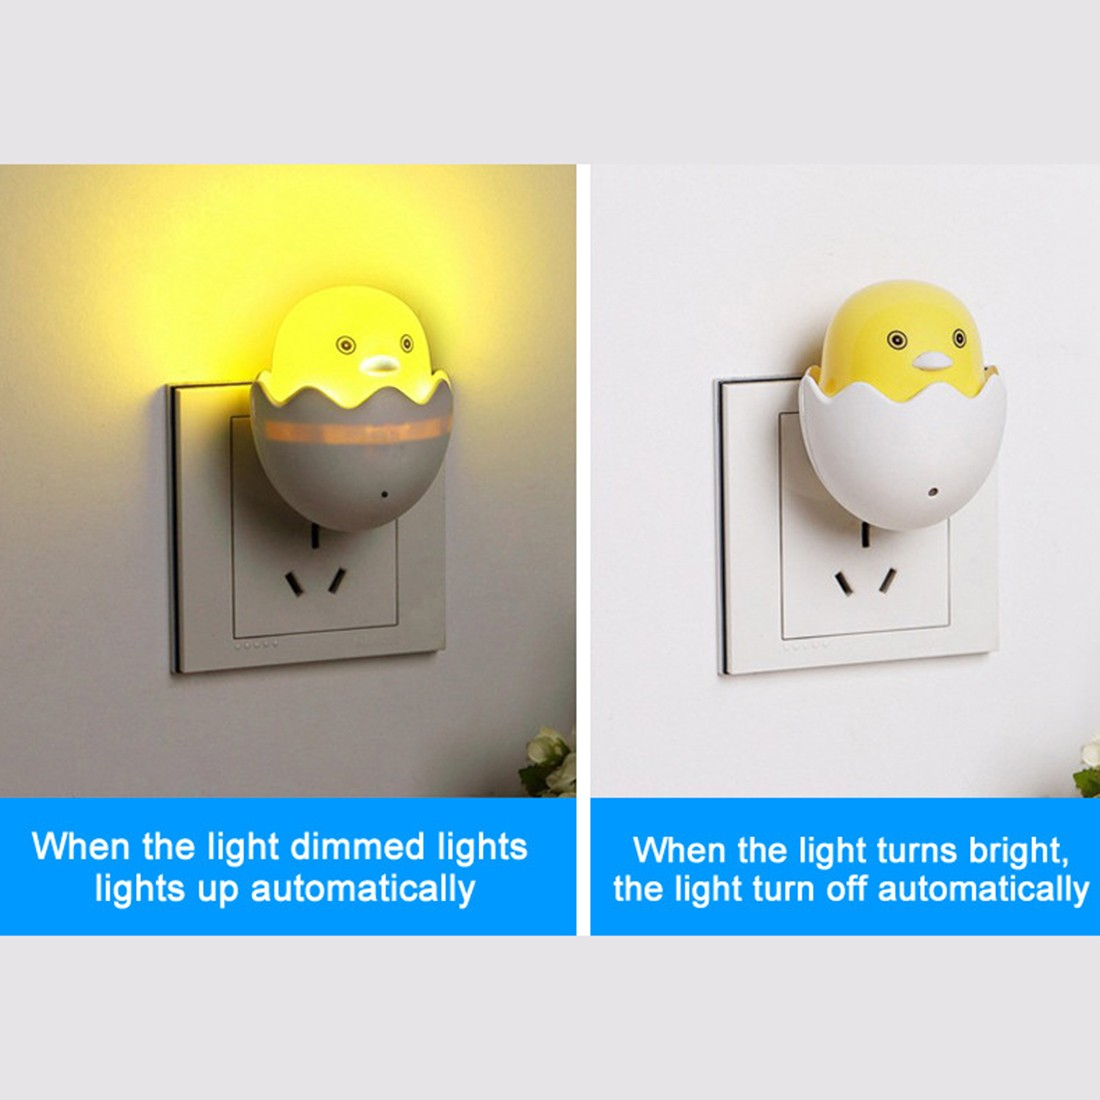 Light Control Sensor Small Yellow Duck Lamps LED Night Light AC 220V EU Plug Wall Socket Bedroom Lamp Gift For Children